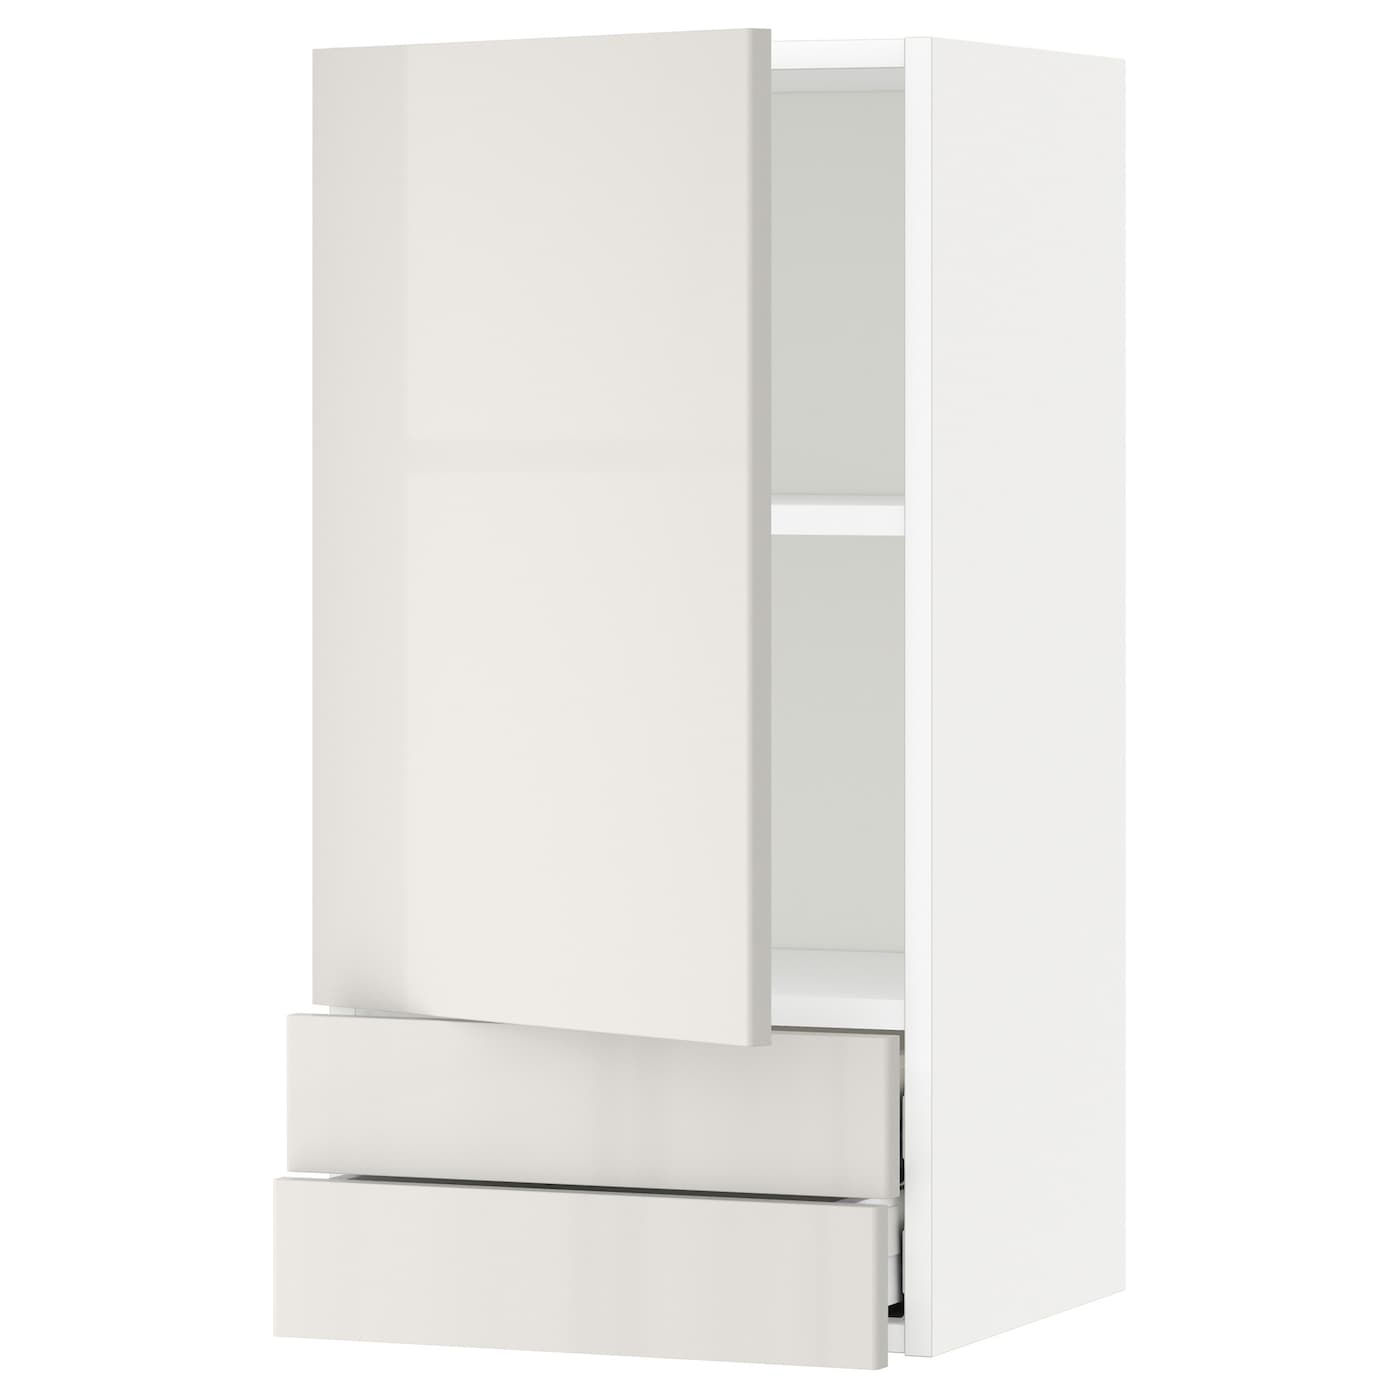 metod maximera lt mural avec porte 2tiroirs blanc ringhult gris clair 40x80 cm ikea. Black Bedroom Furniture Sets. Home Design Ideas